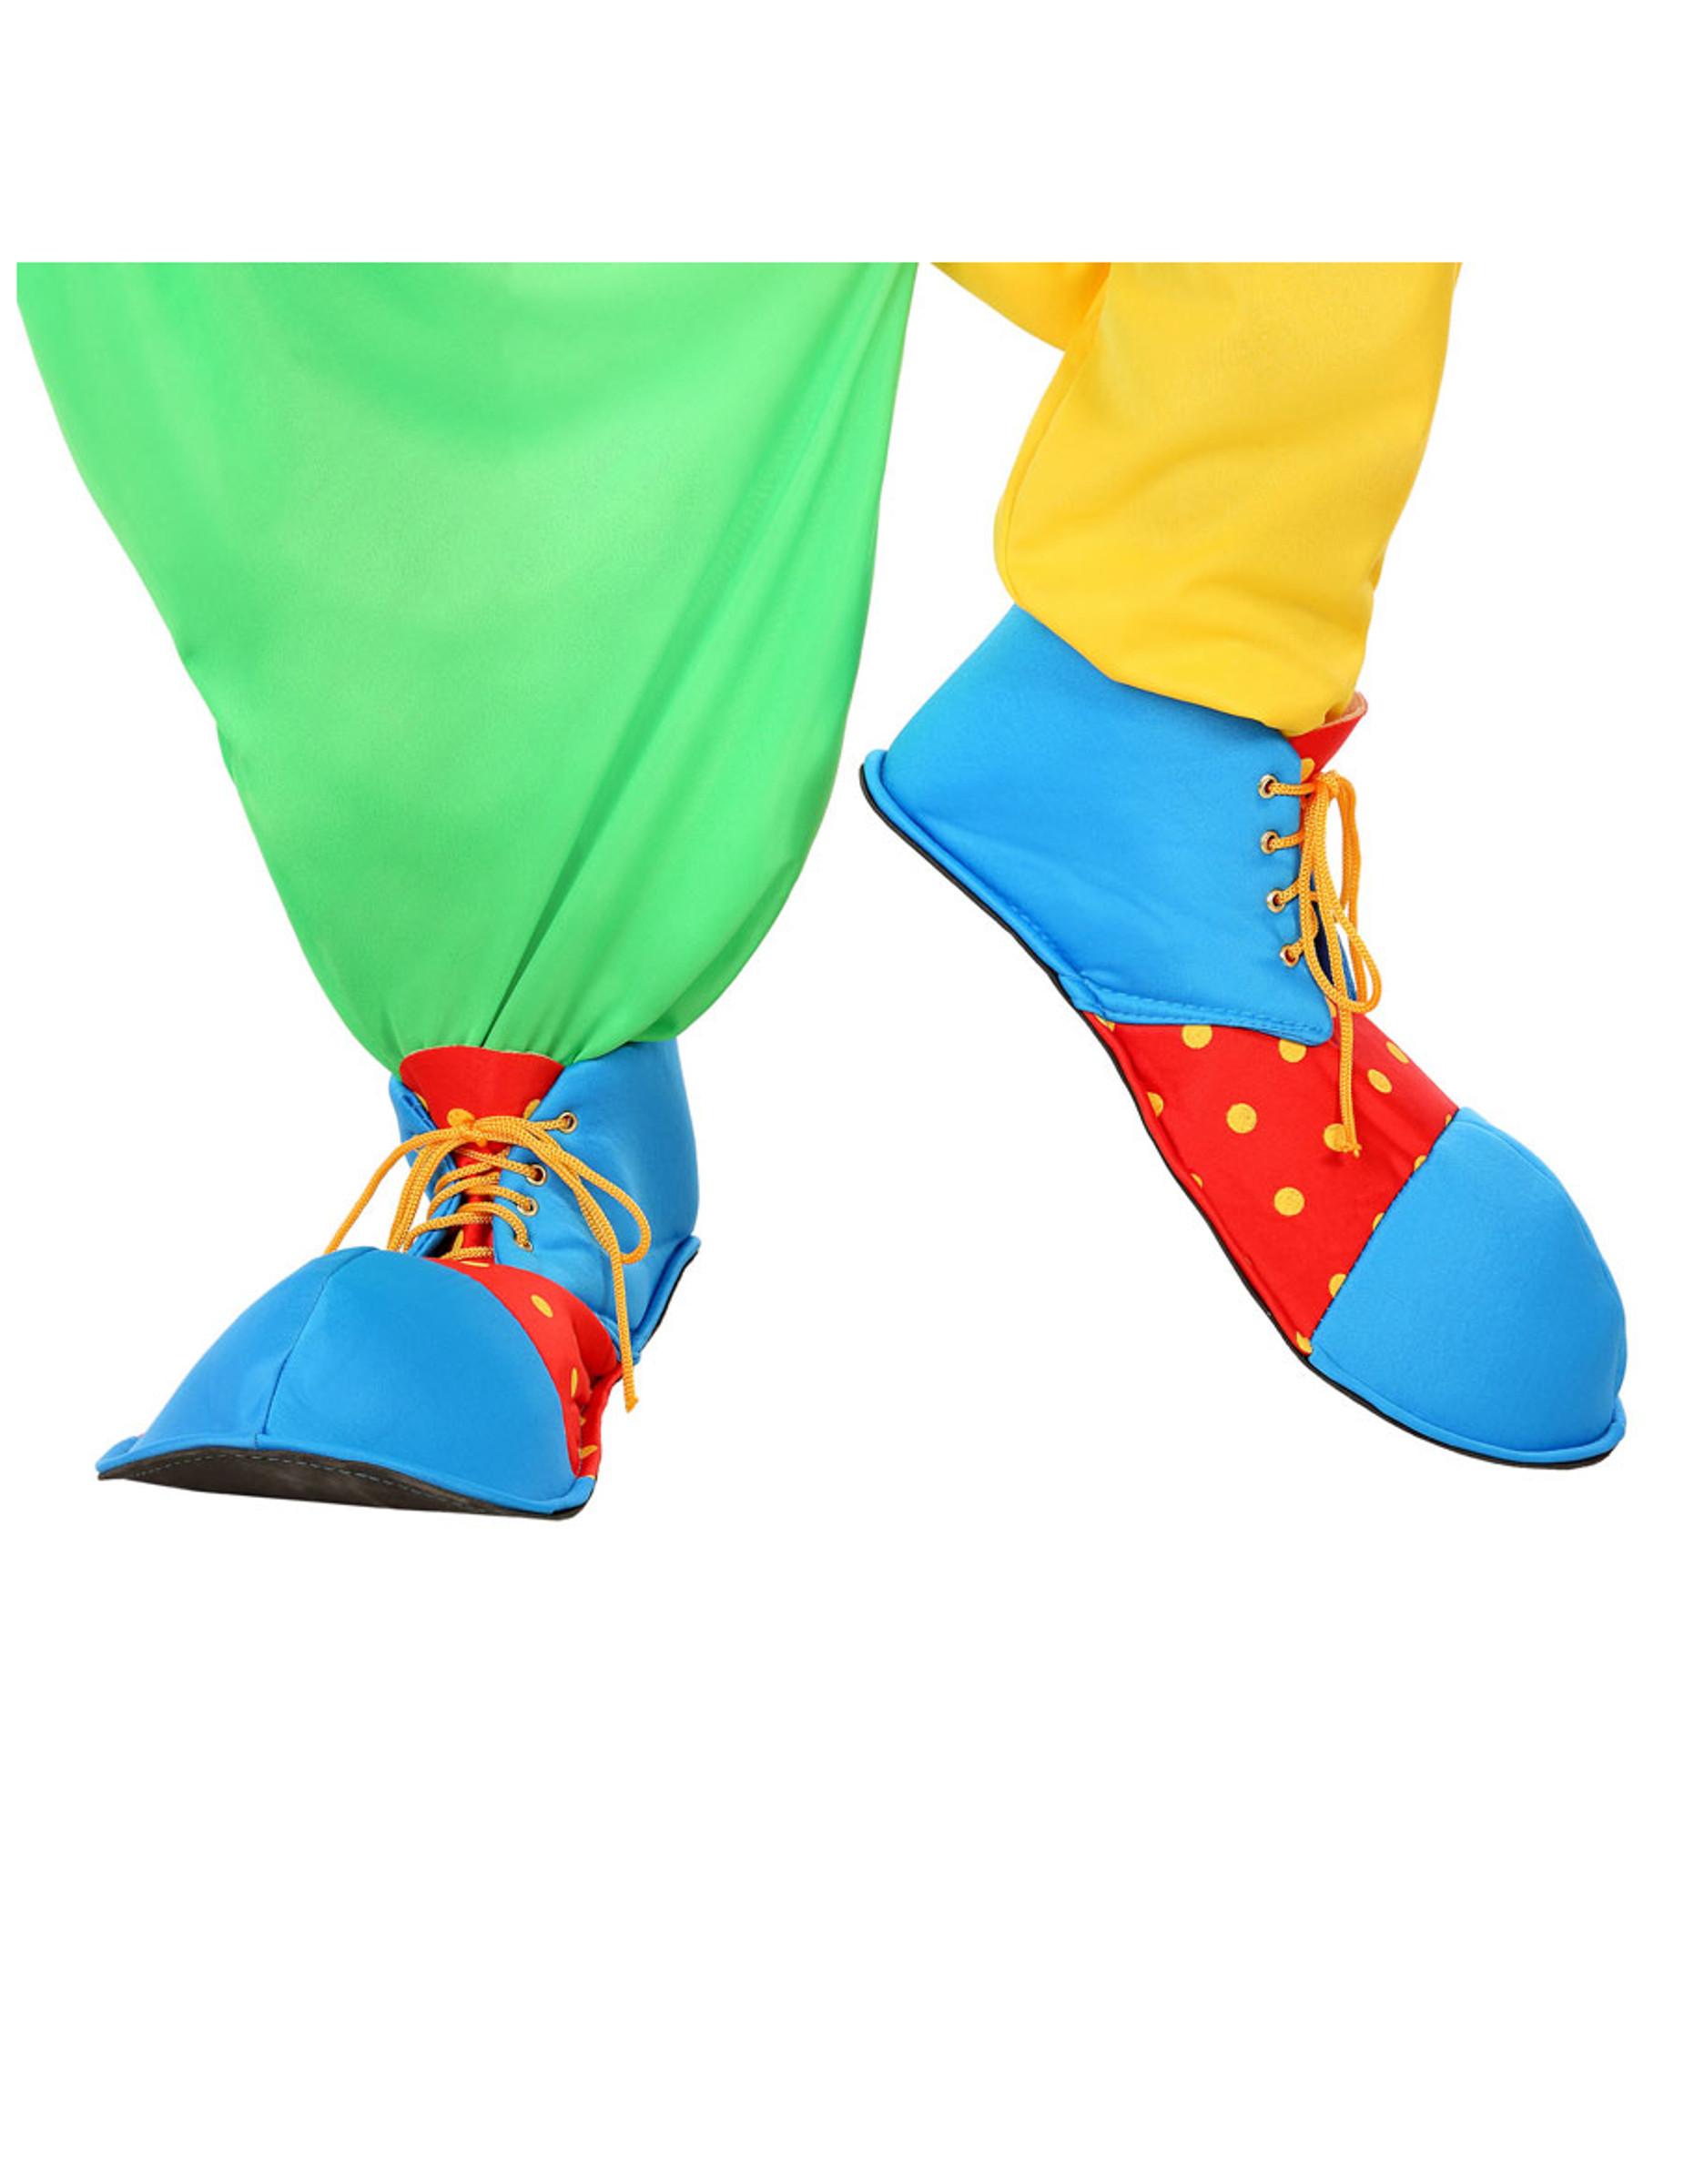 Adulte Chaussures Adulte Clown De Chaussures Clown Clown Adulte De Chaussures Chaussures De De wZXOkPiuT